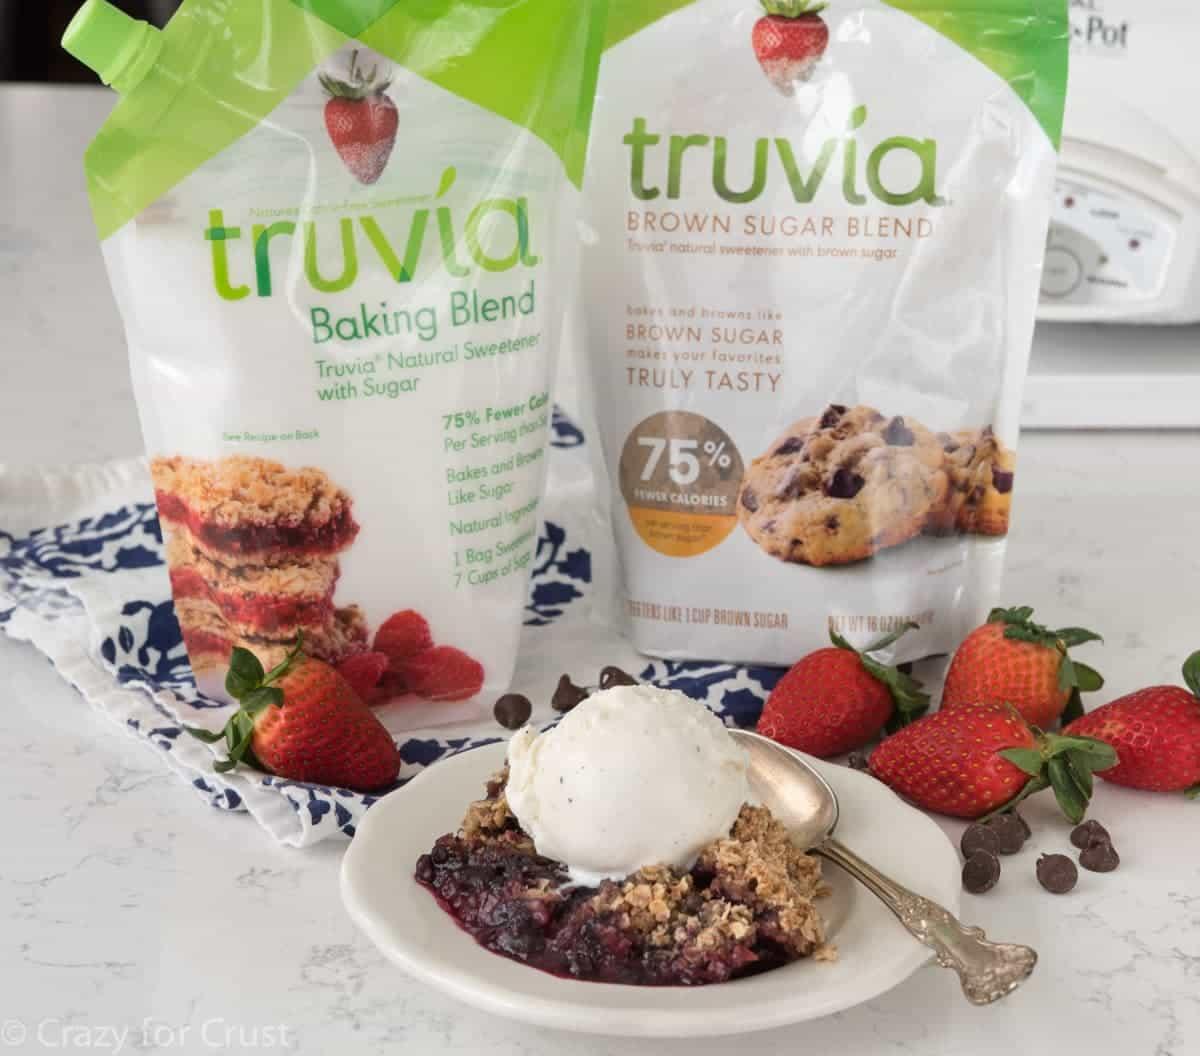 Crockpot Berry Crumble using Truvia